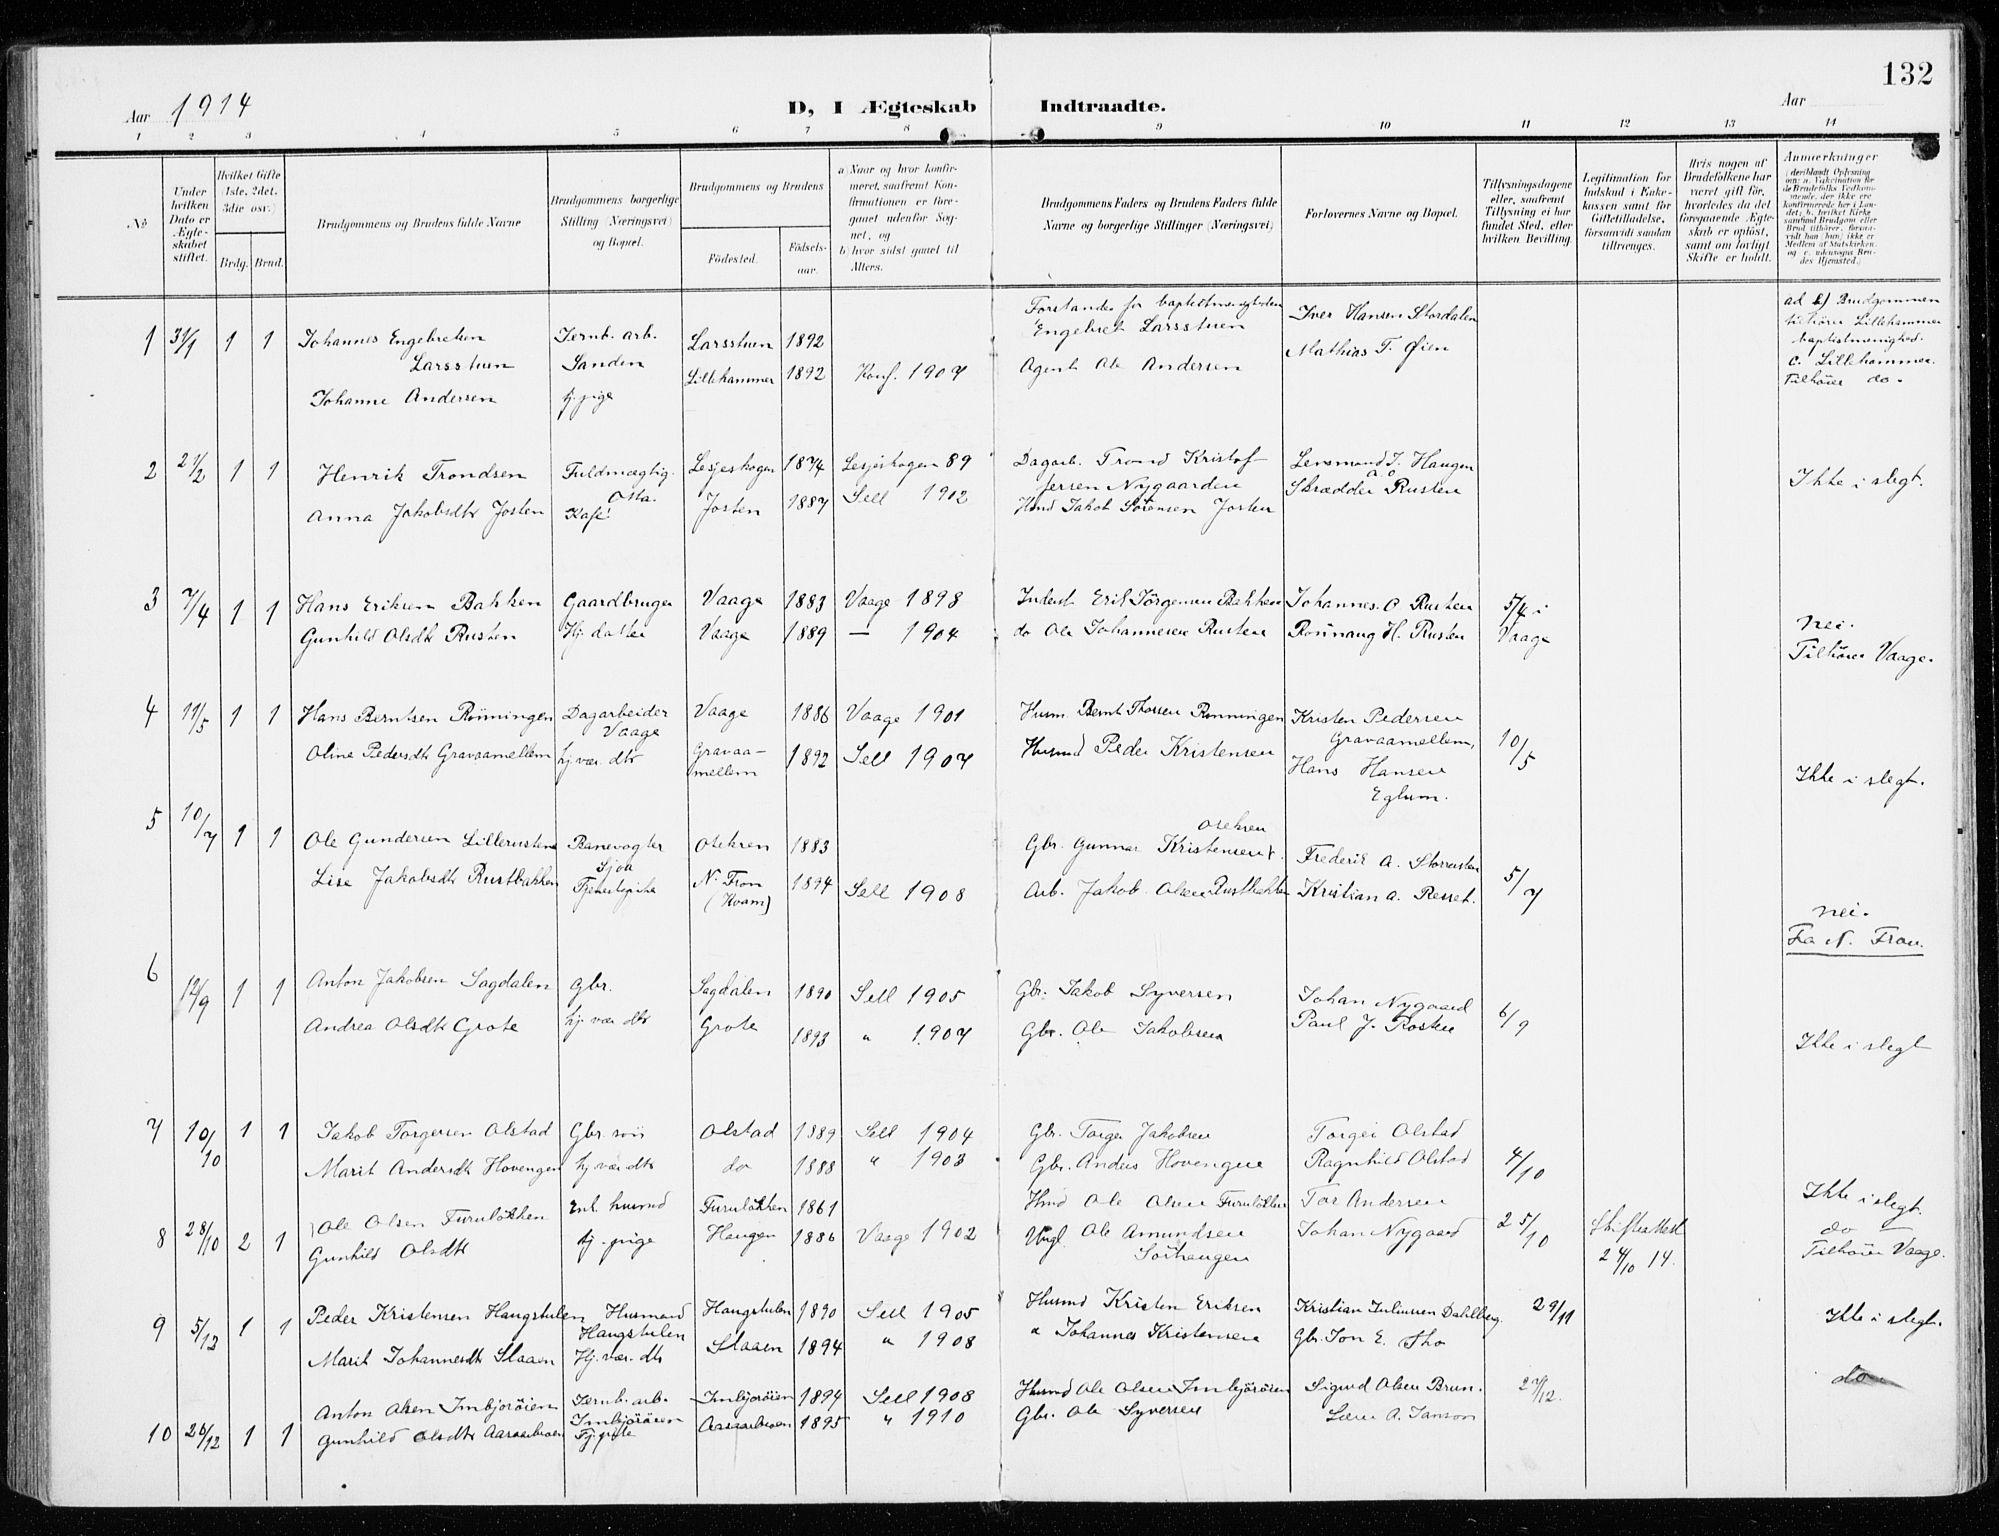 SAH, Sel prestekontor, Ministerialbok nr. 2, 1905-1919, s. 132